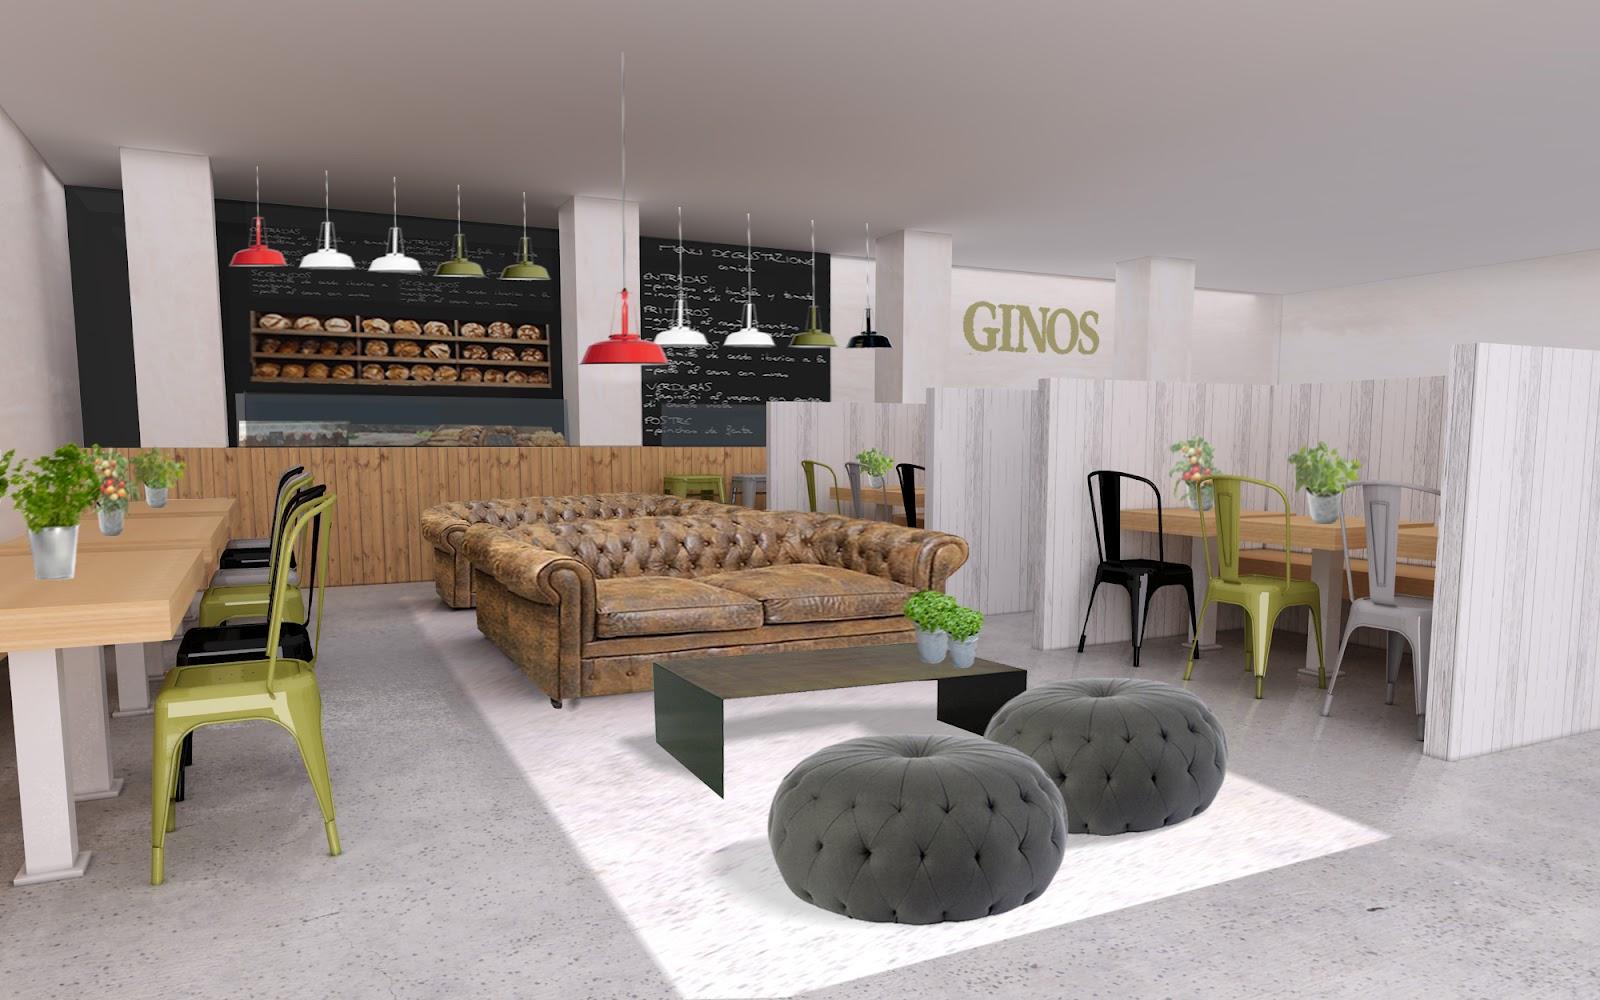 Ginos Restaurante Dise O Interior Ginos Restaurant